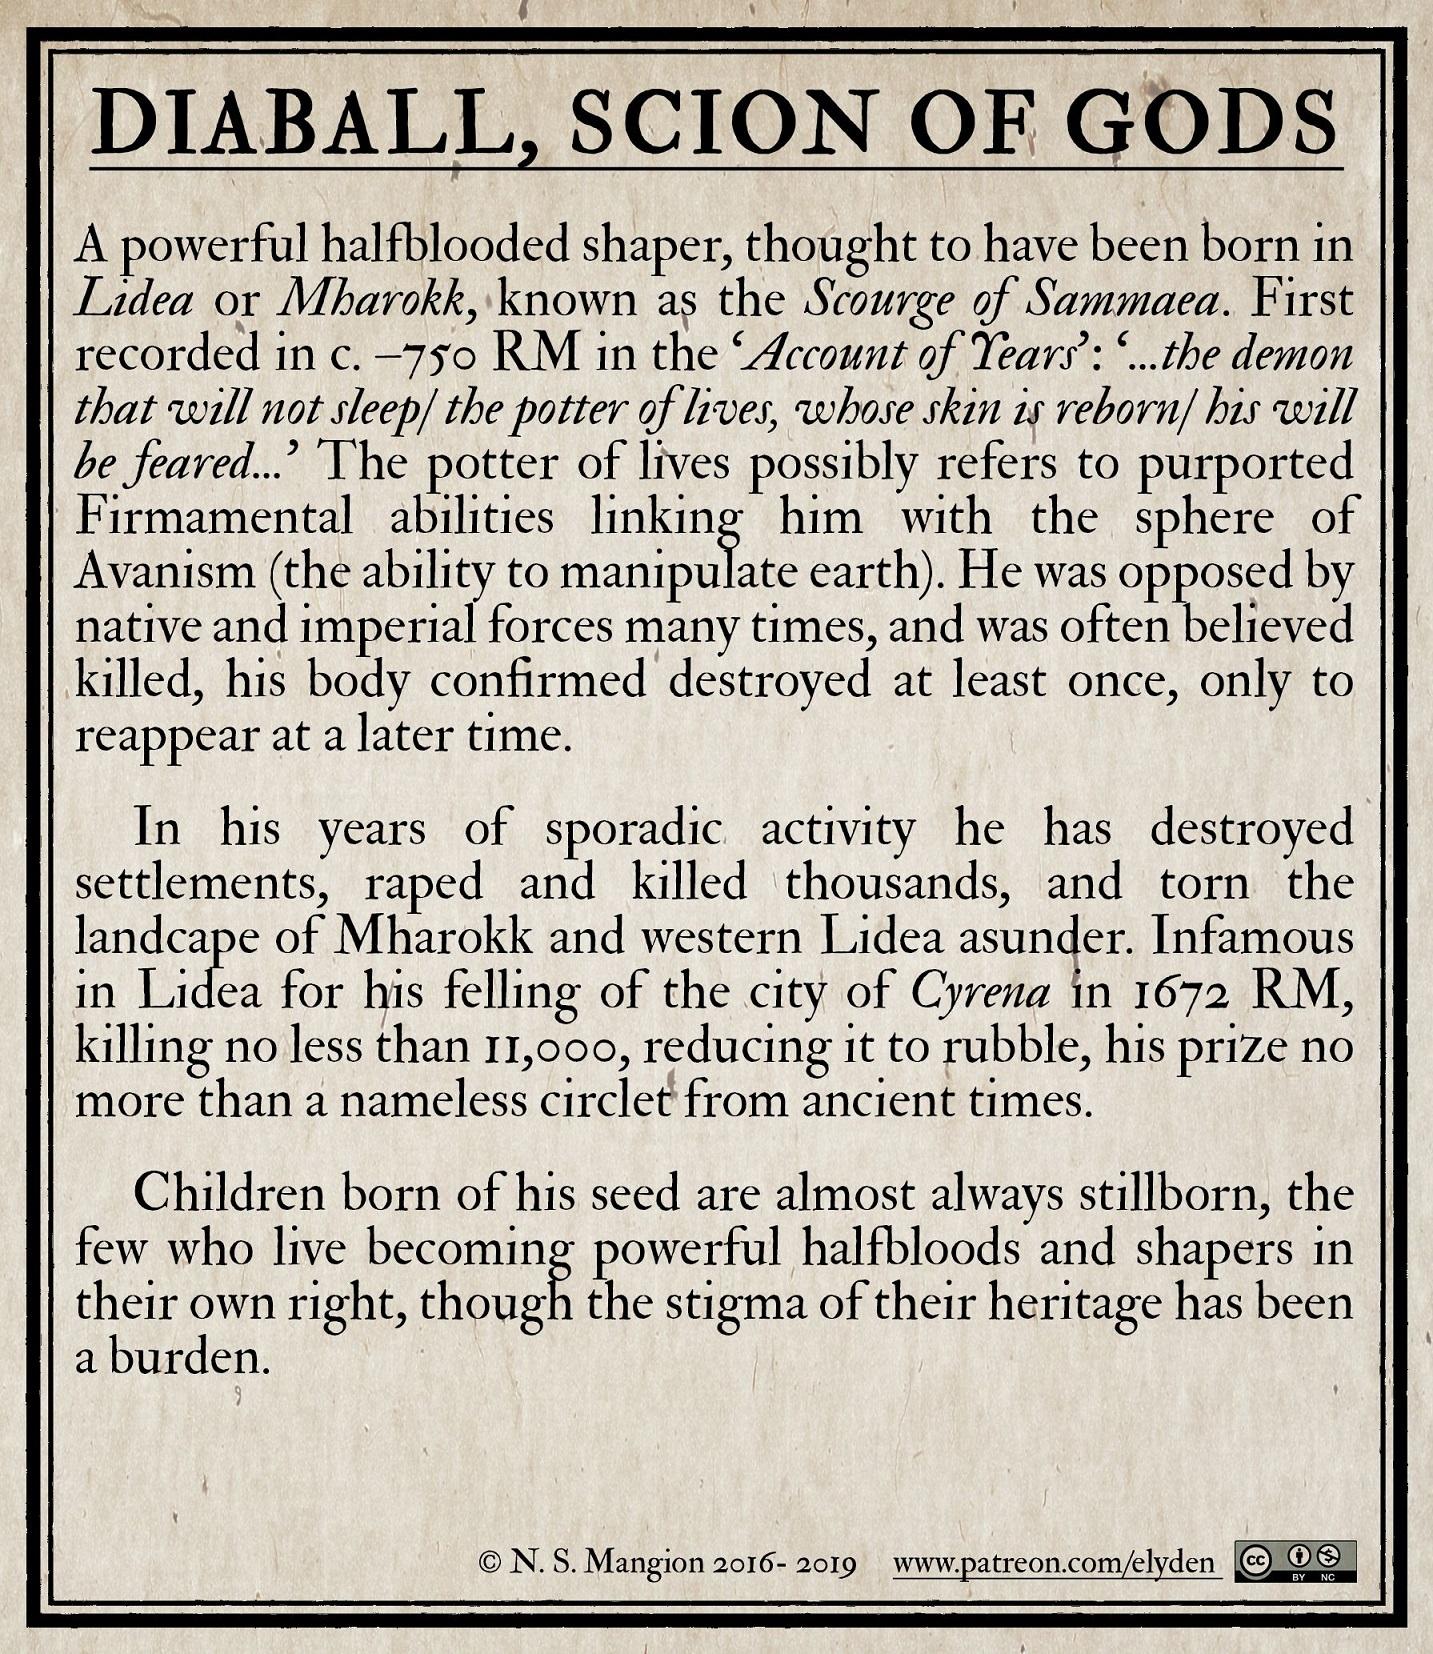 Diaball,  Scion of Gods